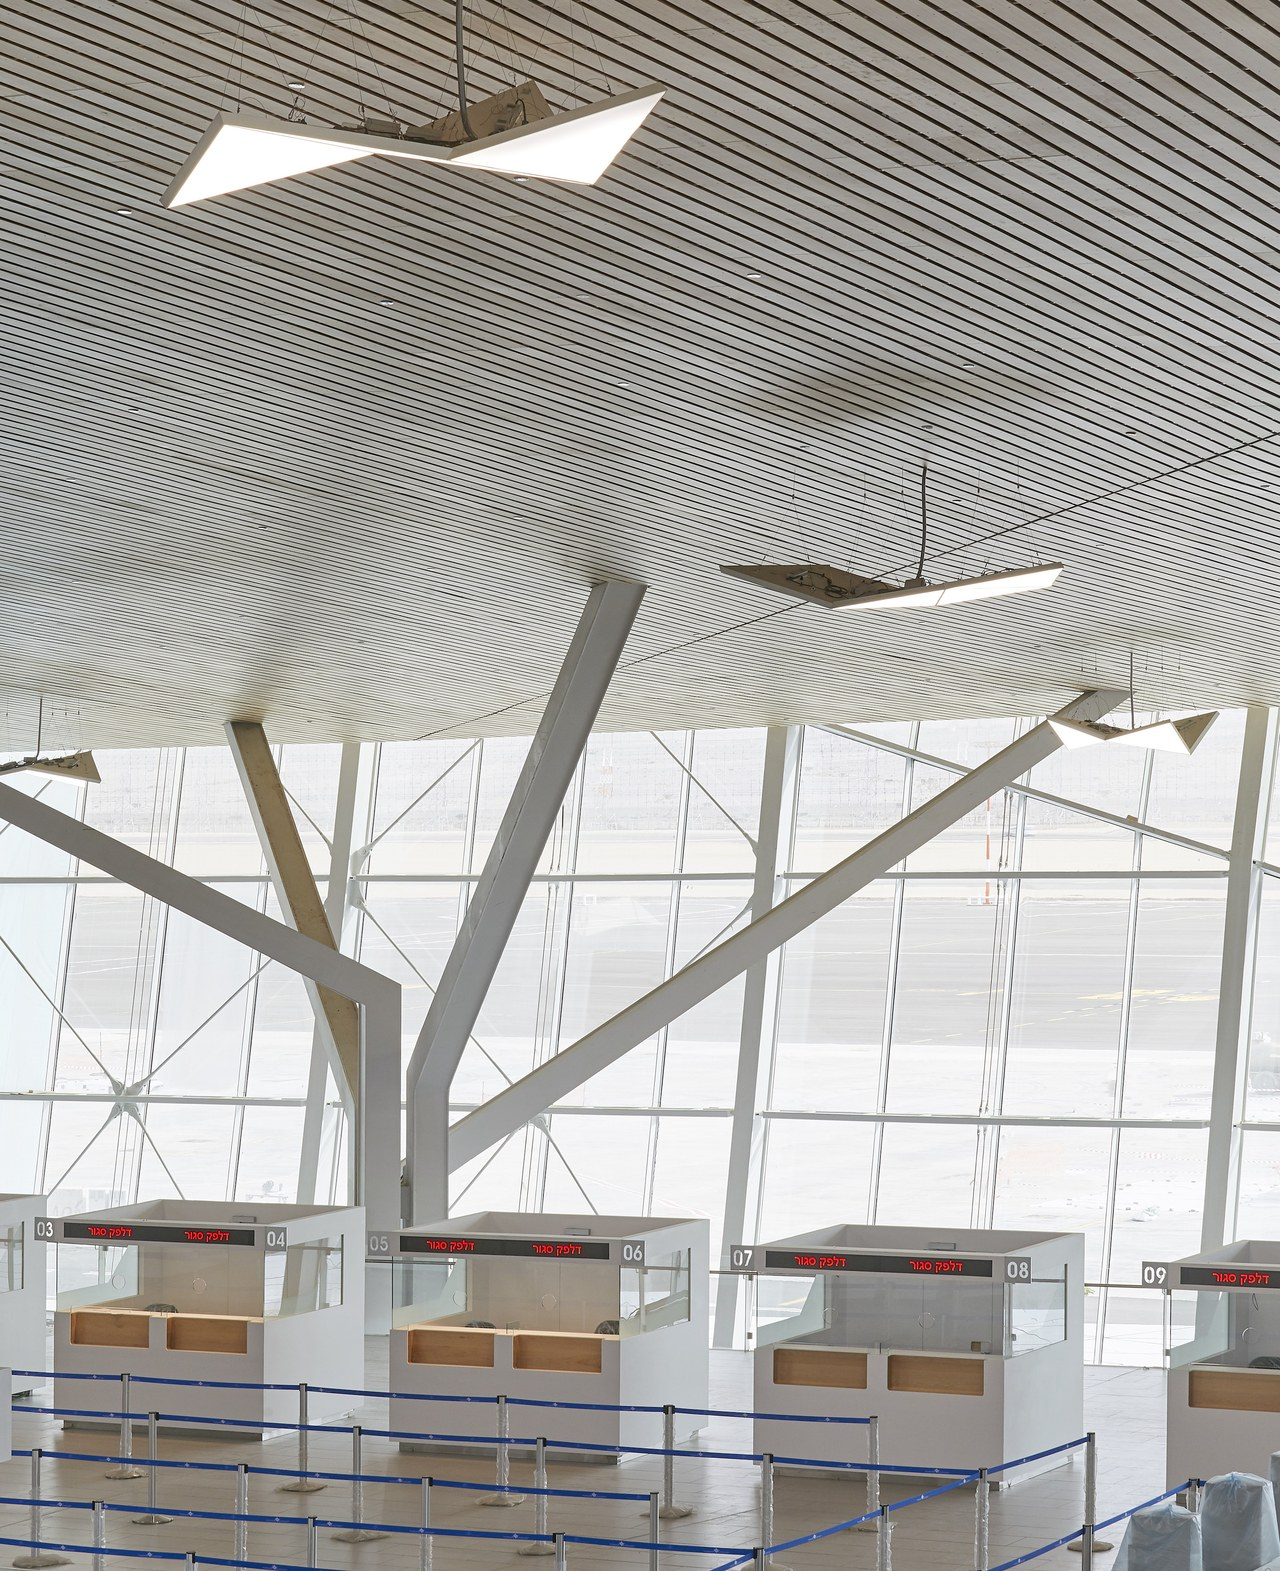 ramon airport 3